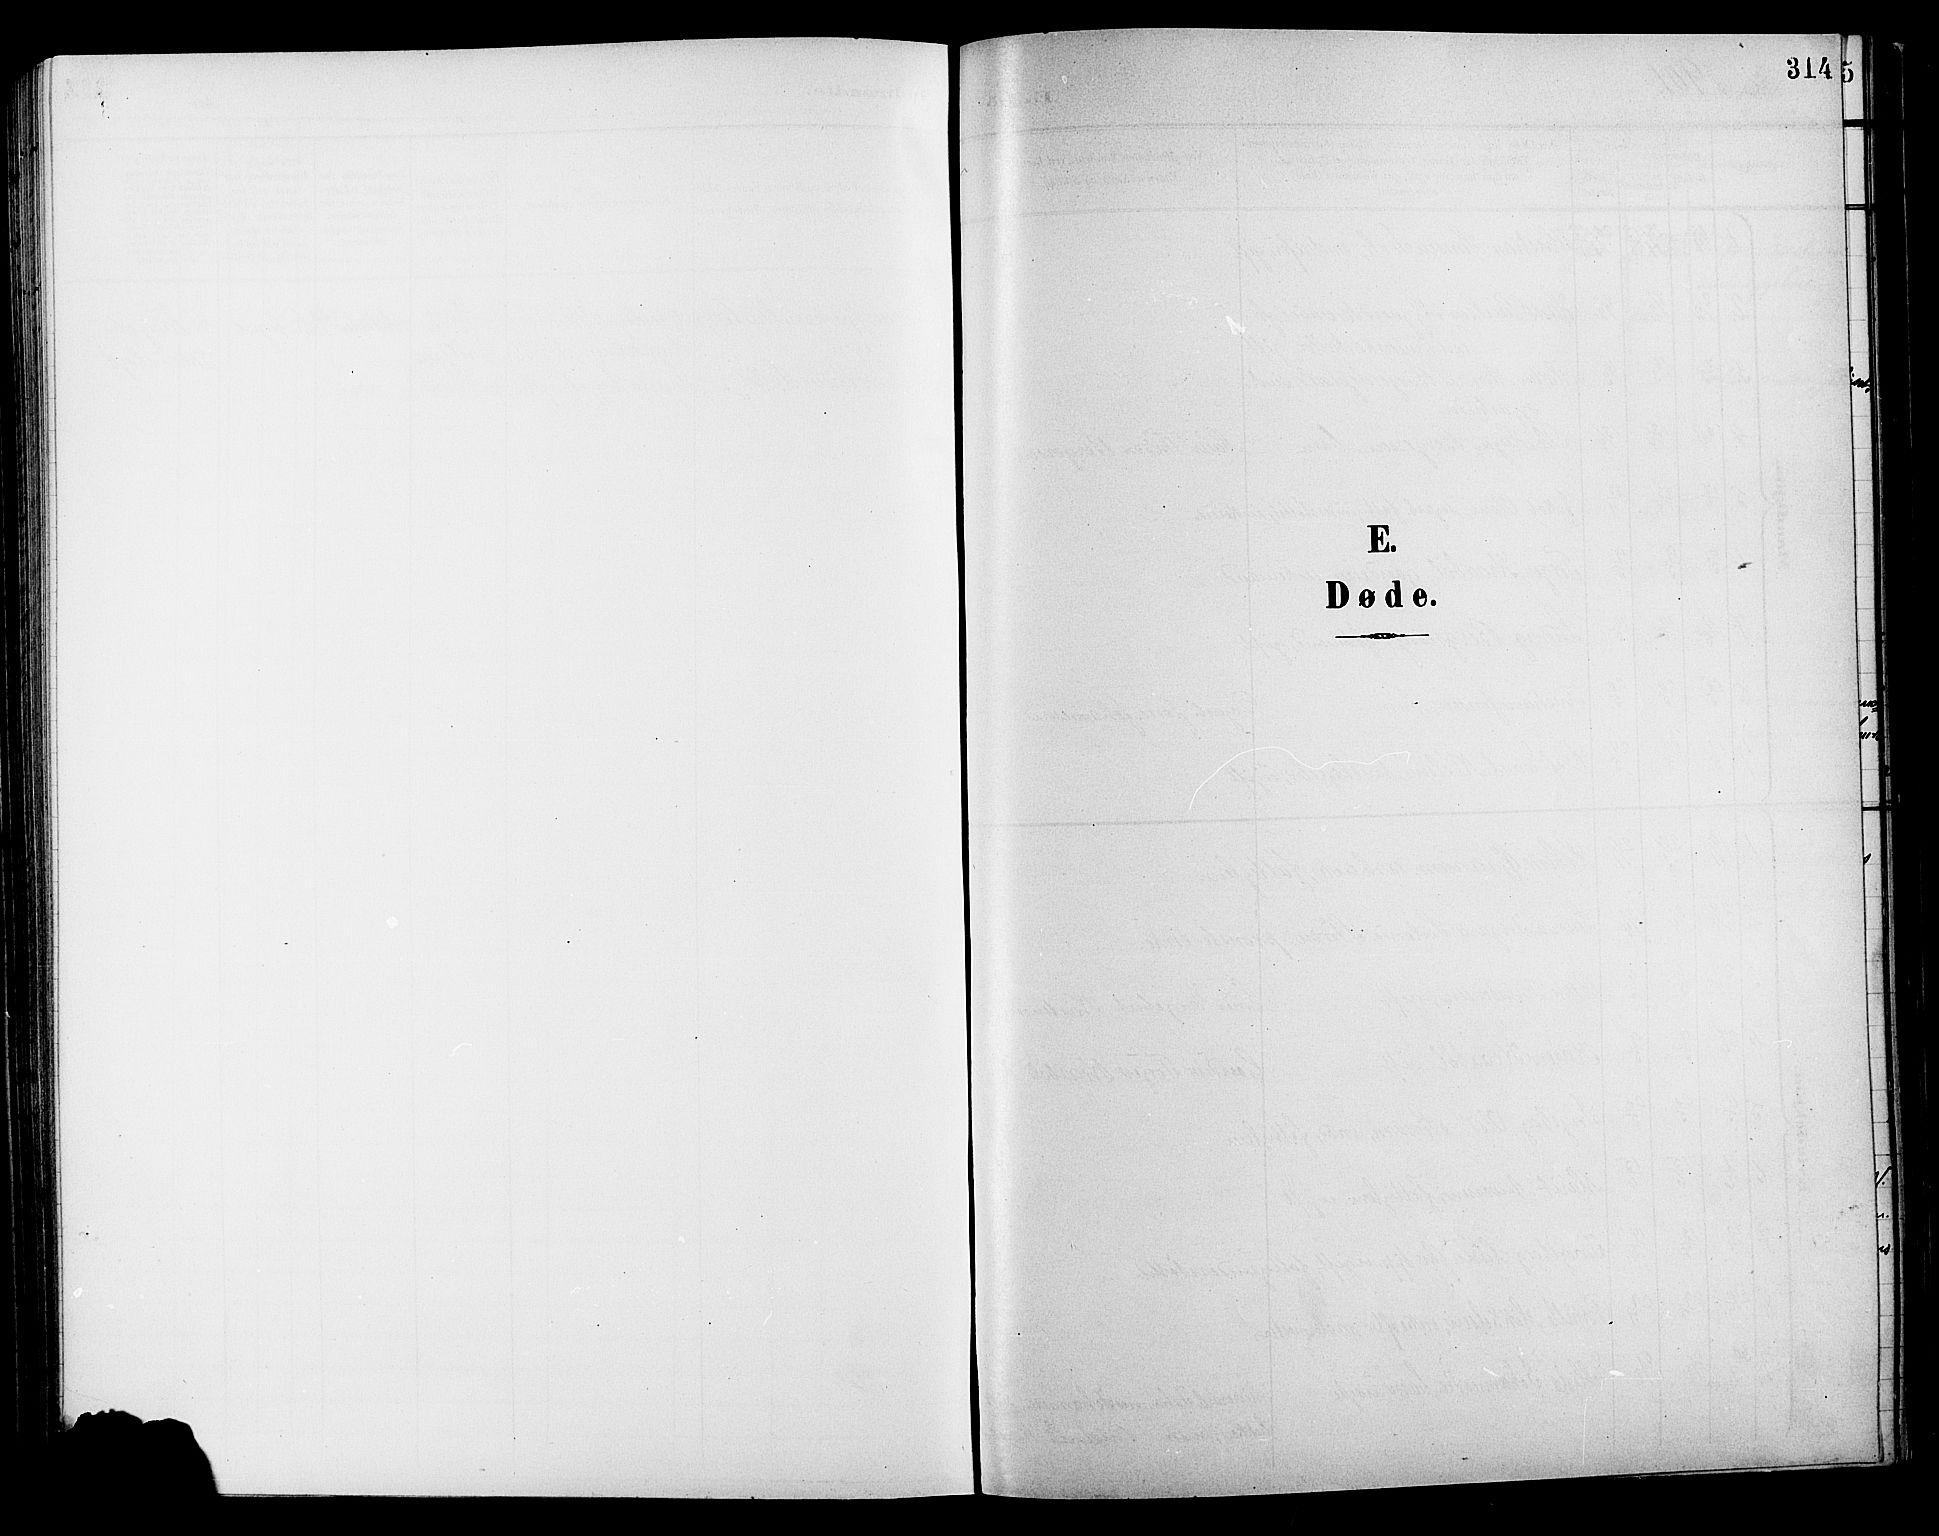 SAH, Lillehammer prestekontor, H/Ha/Hab/L0001: Parish register (copy) no. 1, 1901-1913, p. 314